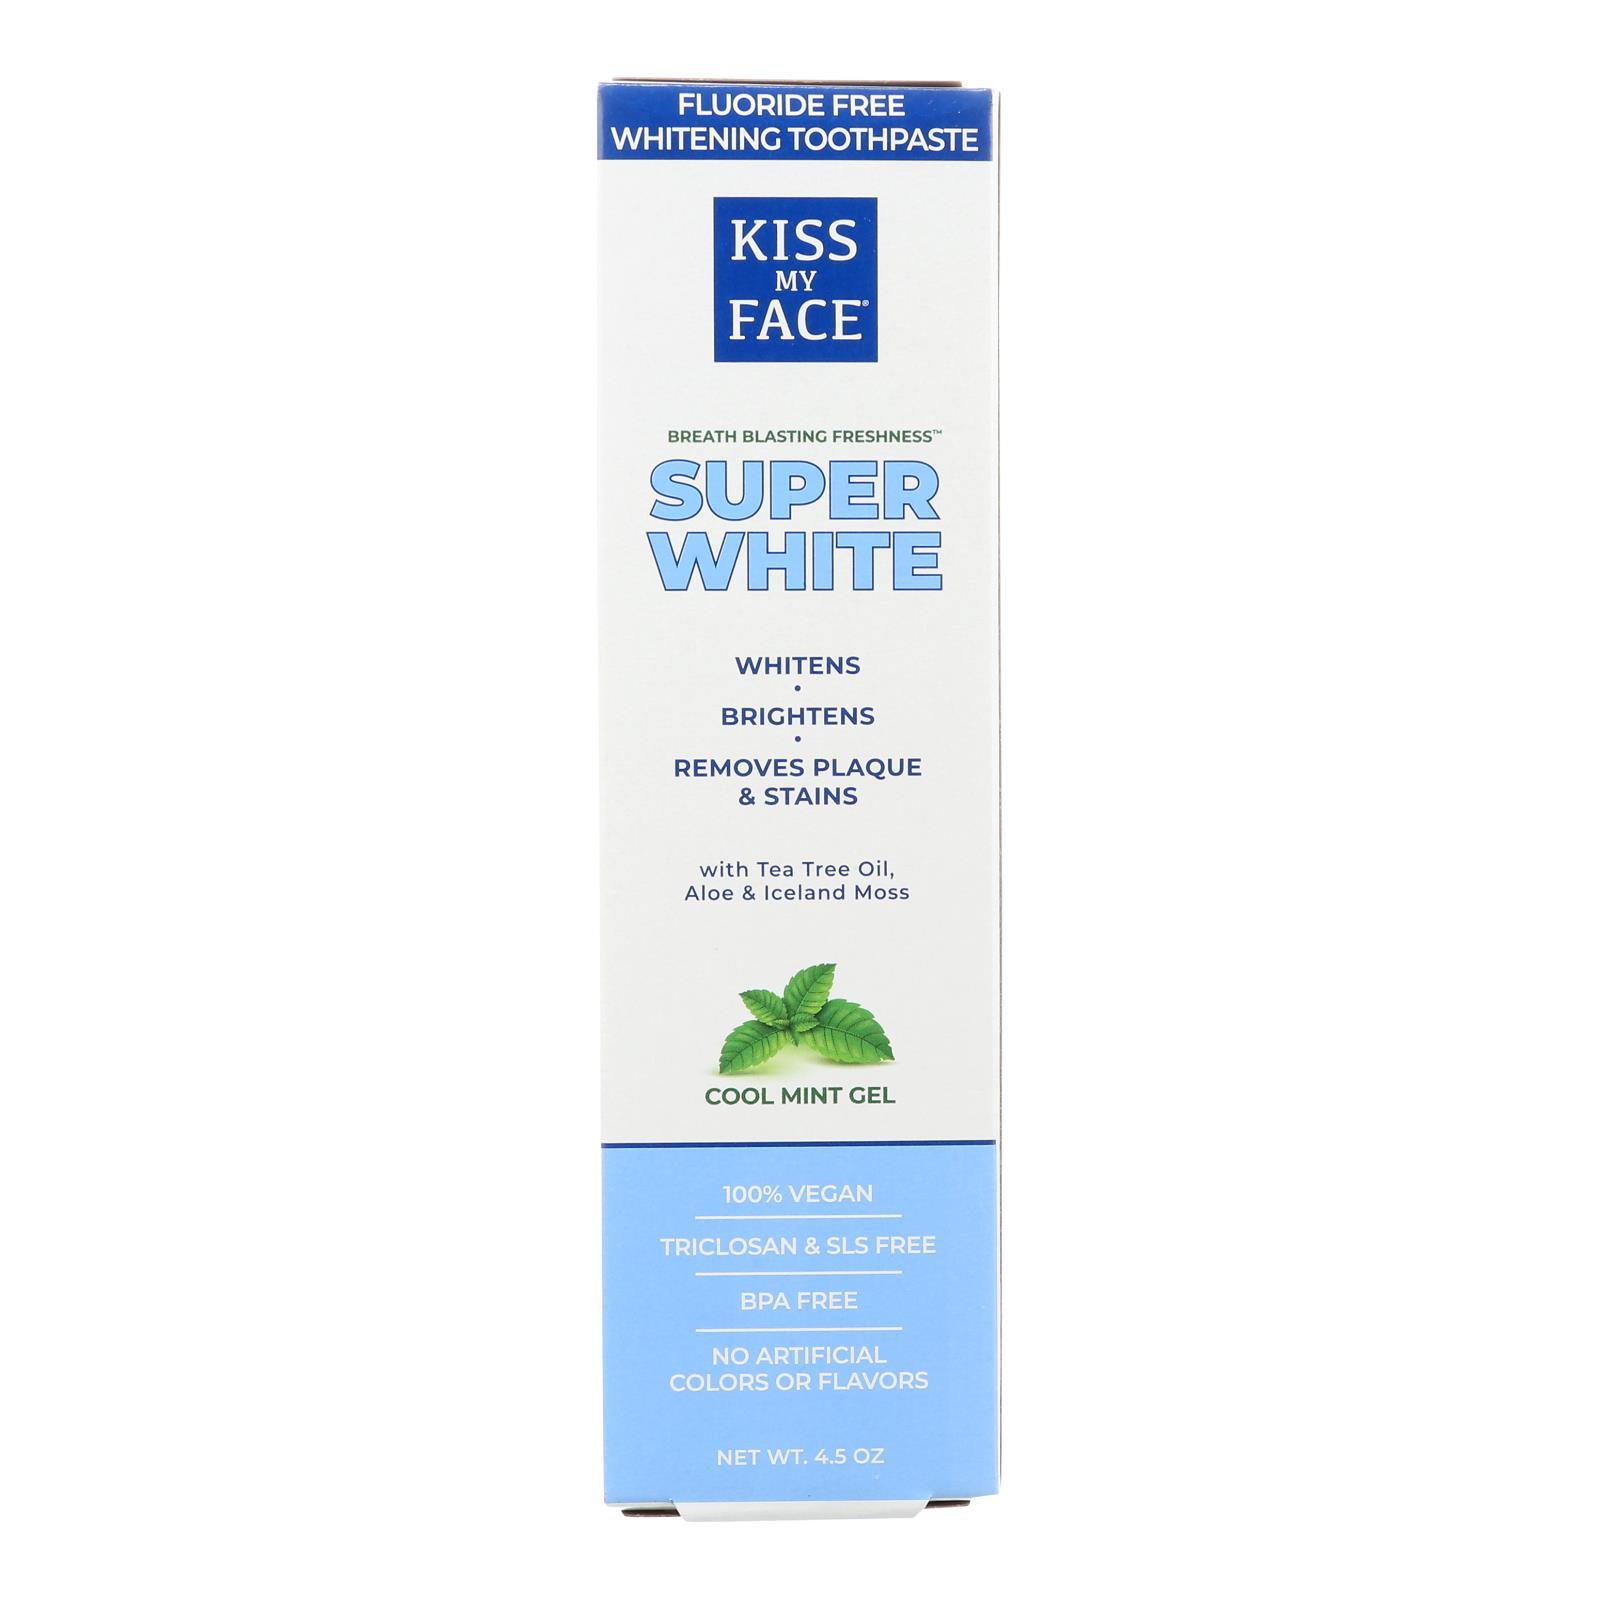 Kiss My Face Toothpaste - Whitening - Fluoride Free - Gel - 4.5 oz